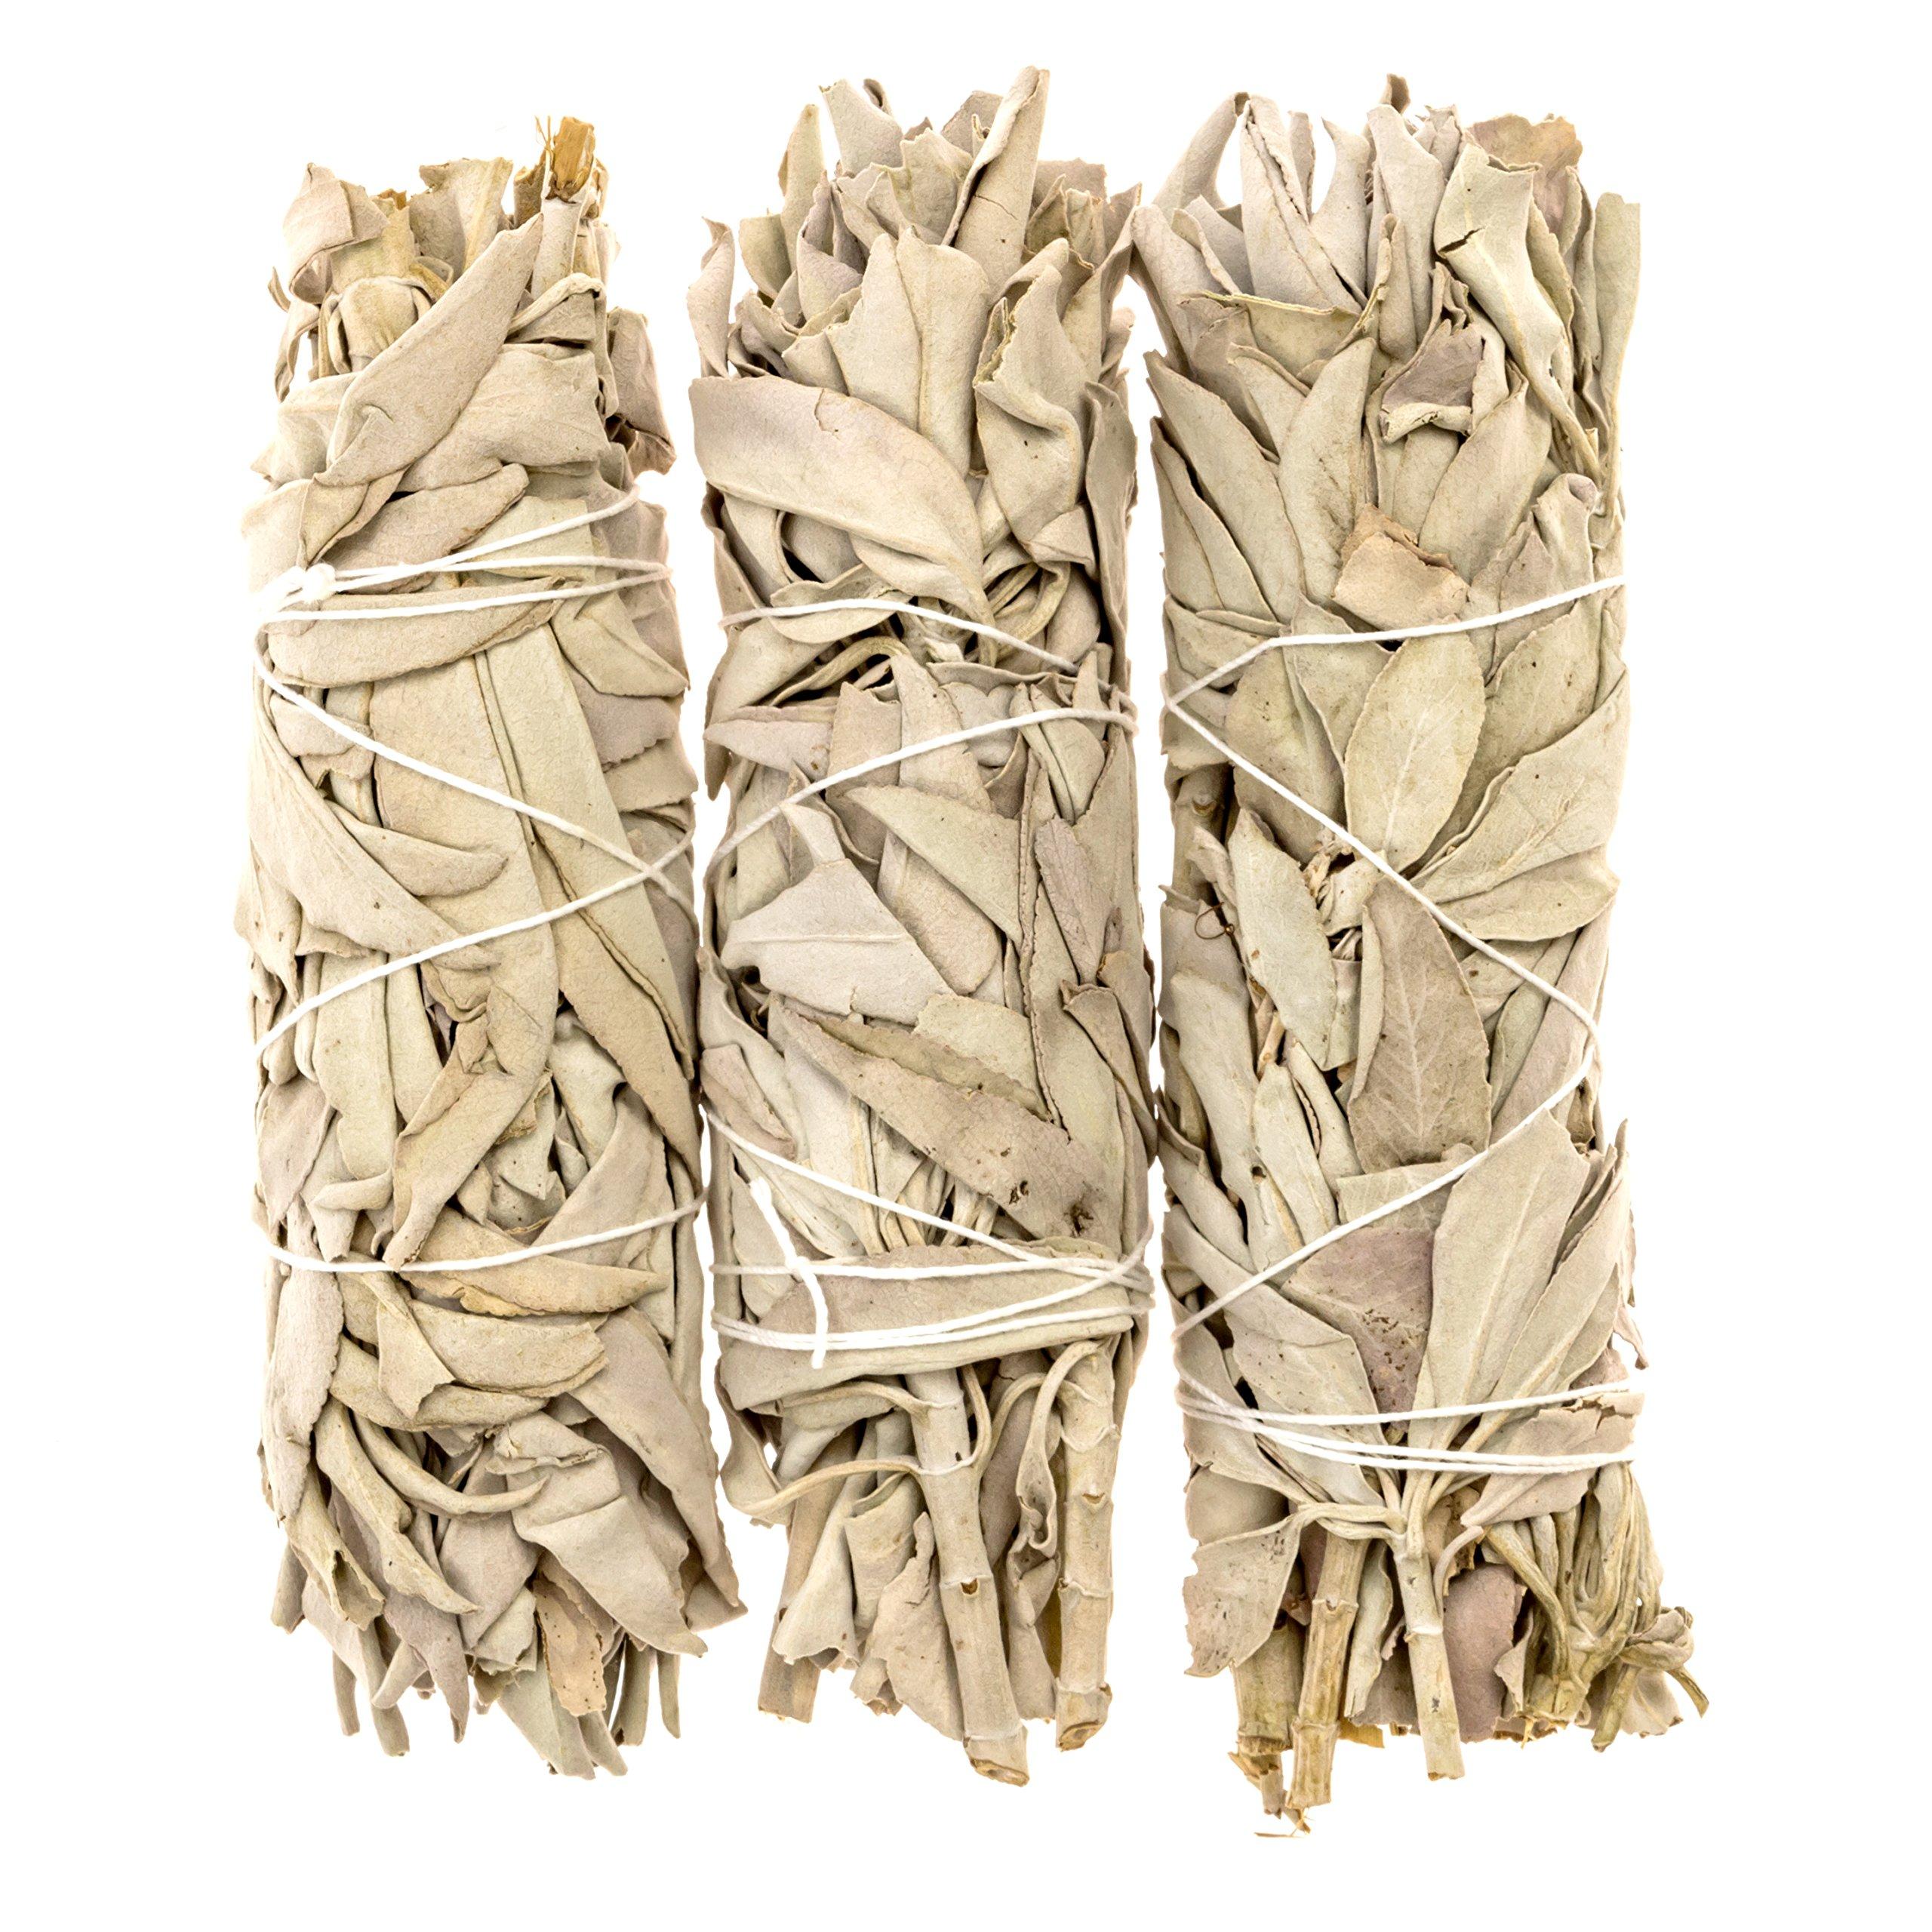 Alternative Imagination Premium California White Sage Smudge Sticks - 5 Inch Medium Sized - Package of 3 by Alternative Imagination (Image #4)